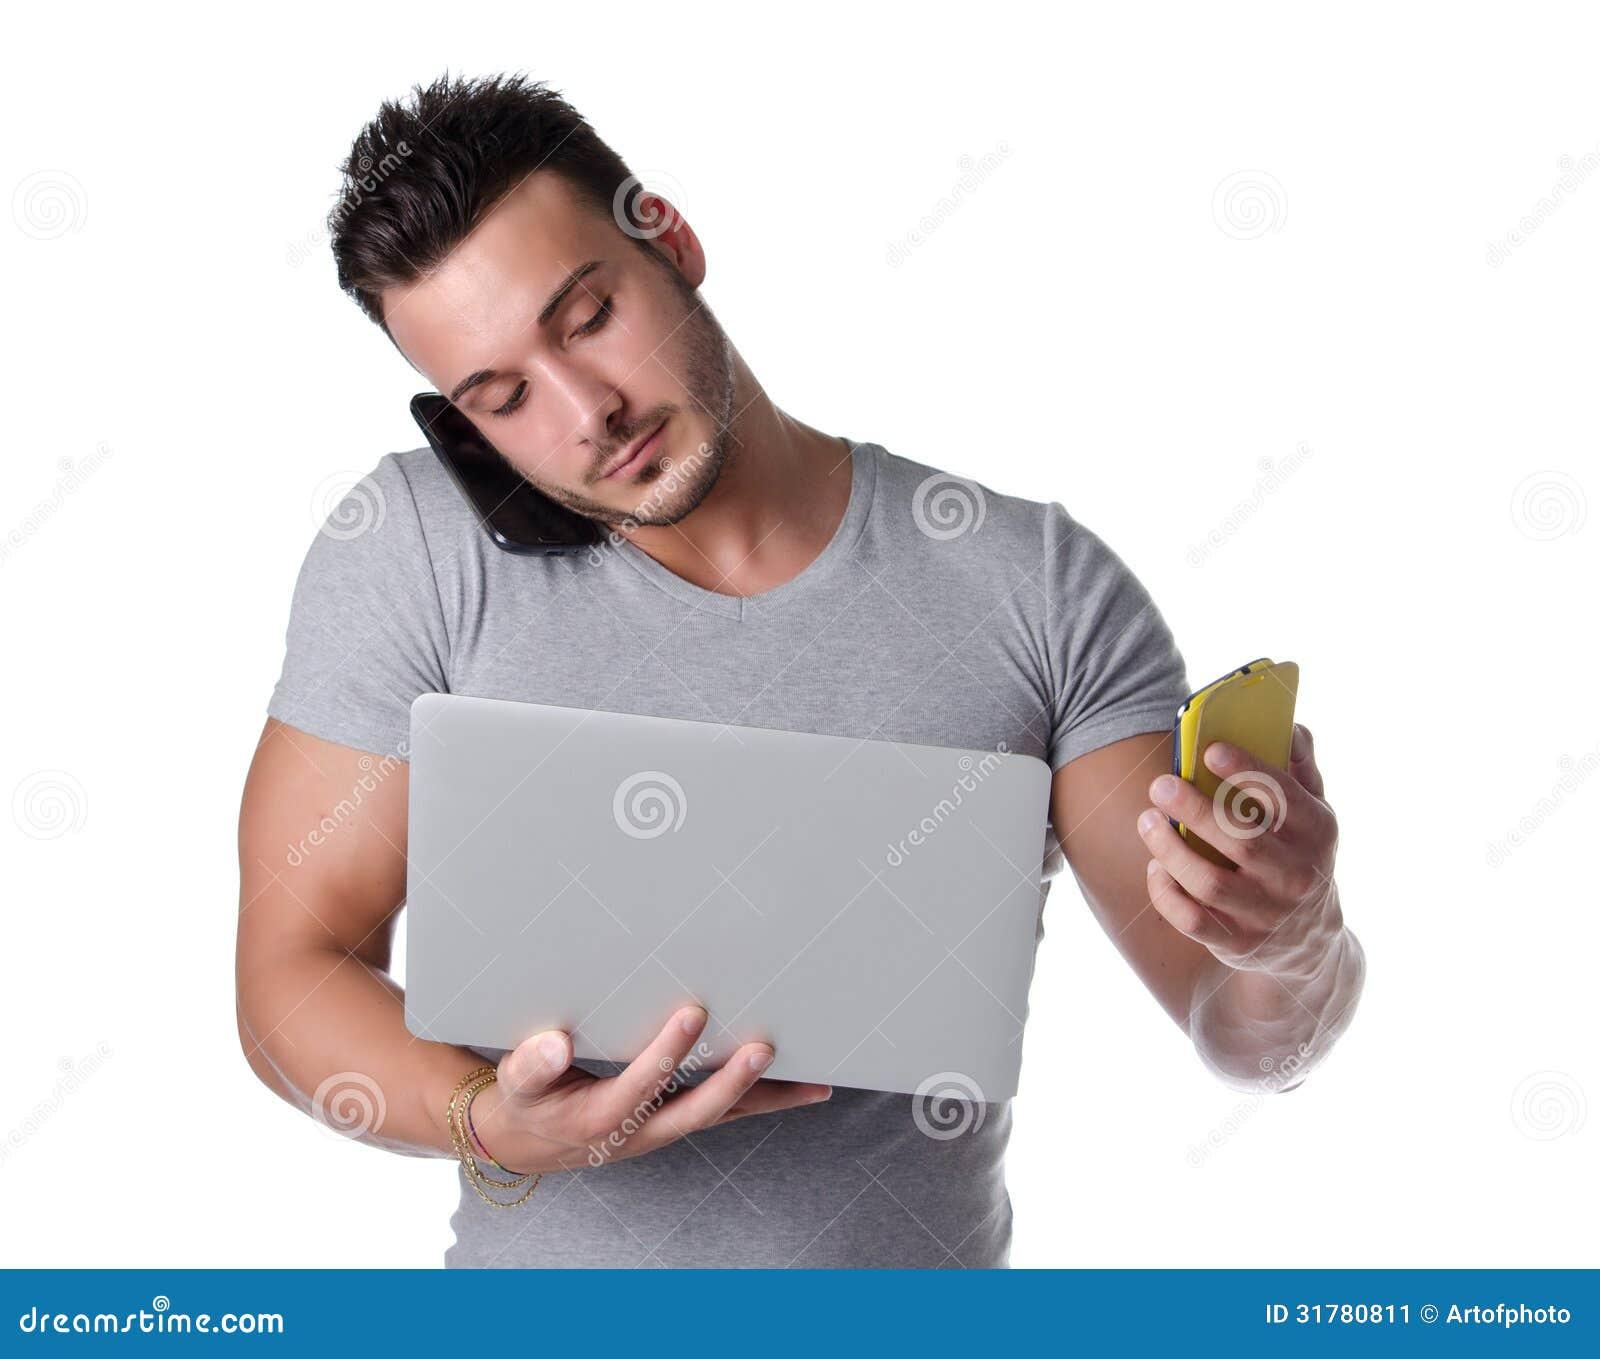 Irwin teacher on porn website